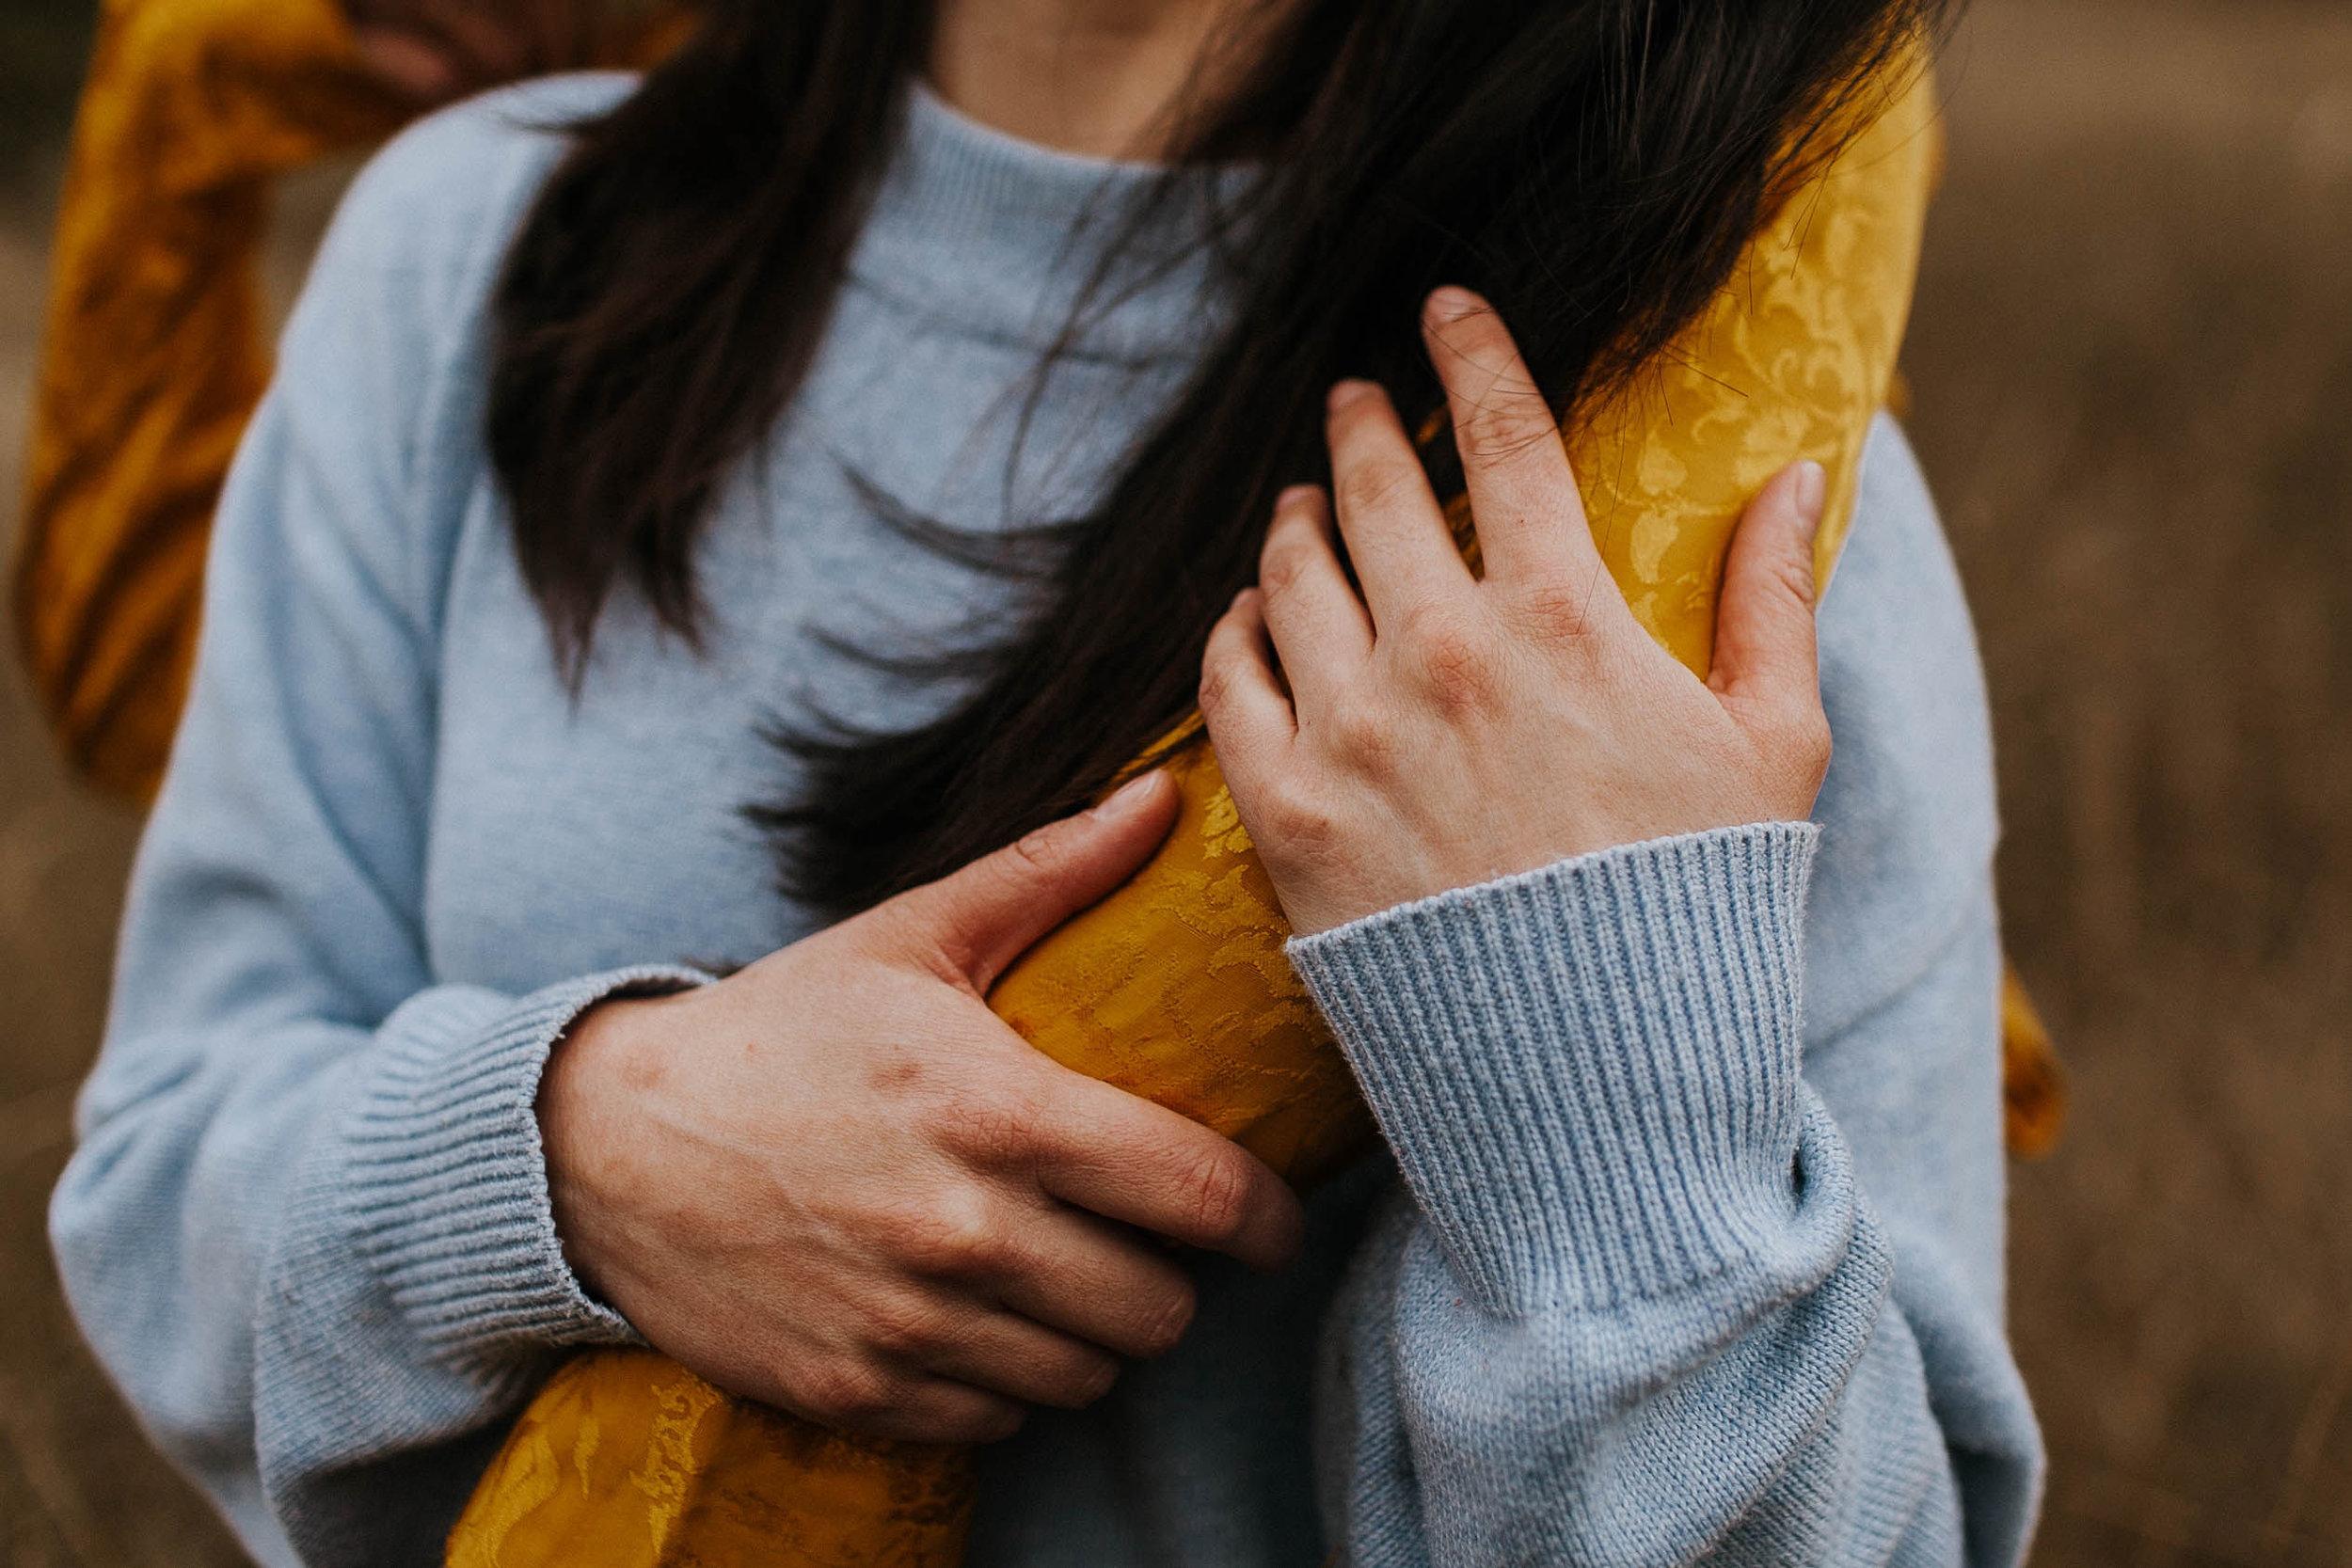 detail of a woman's hands in a grassy field in Seattle WA